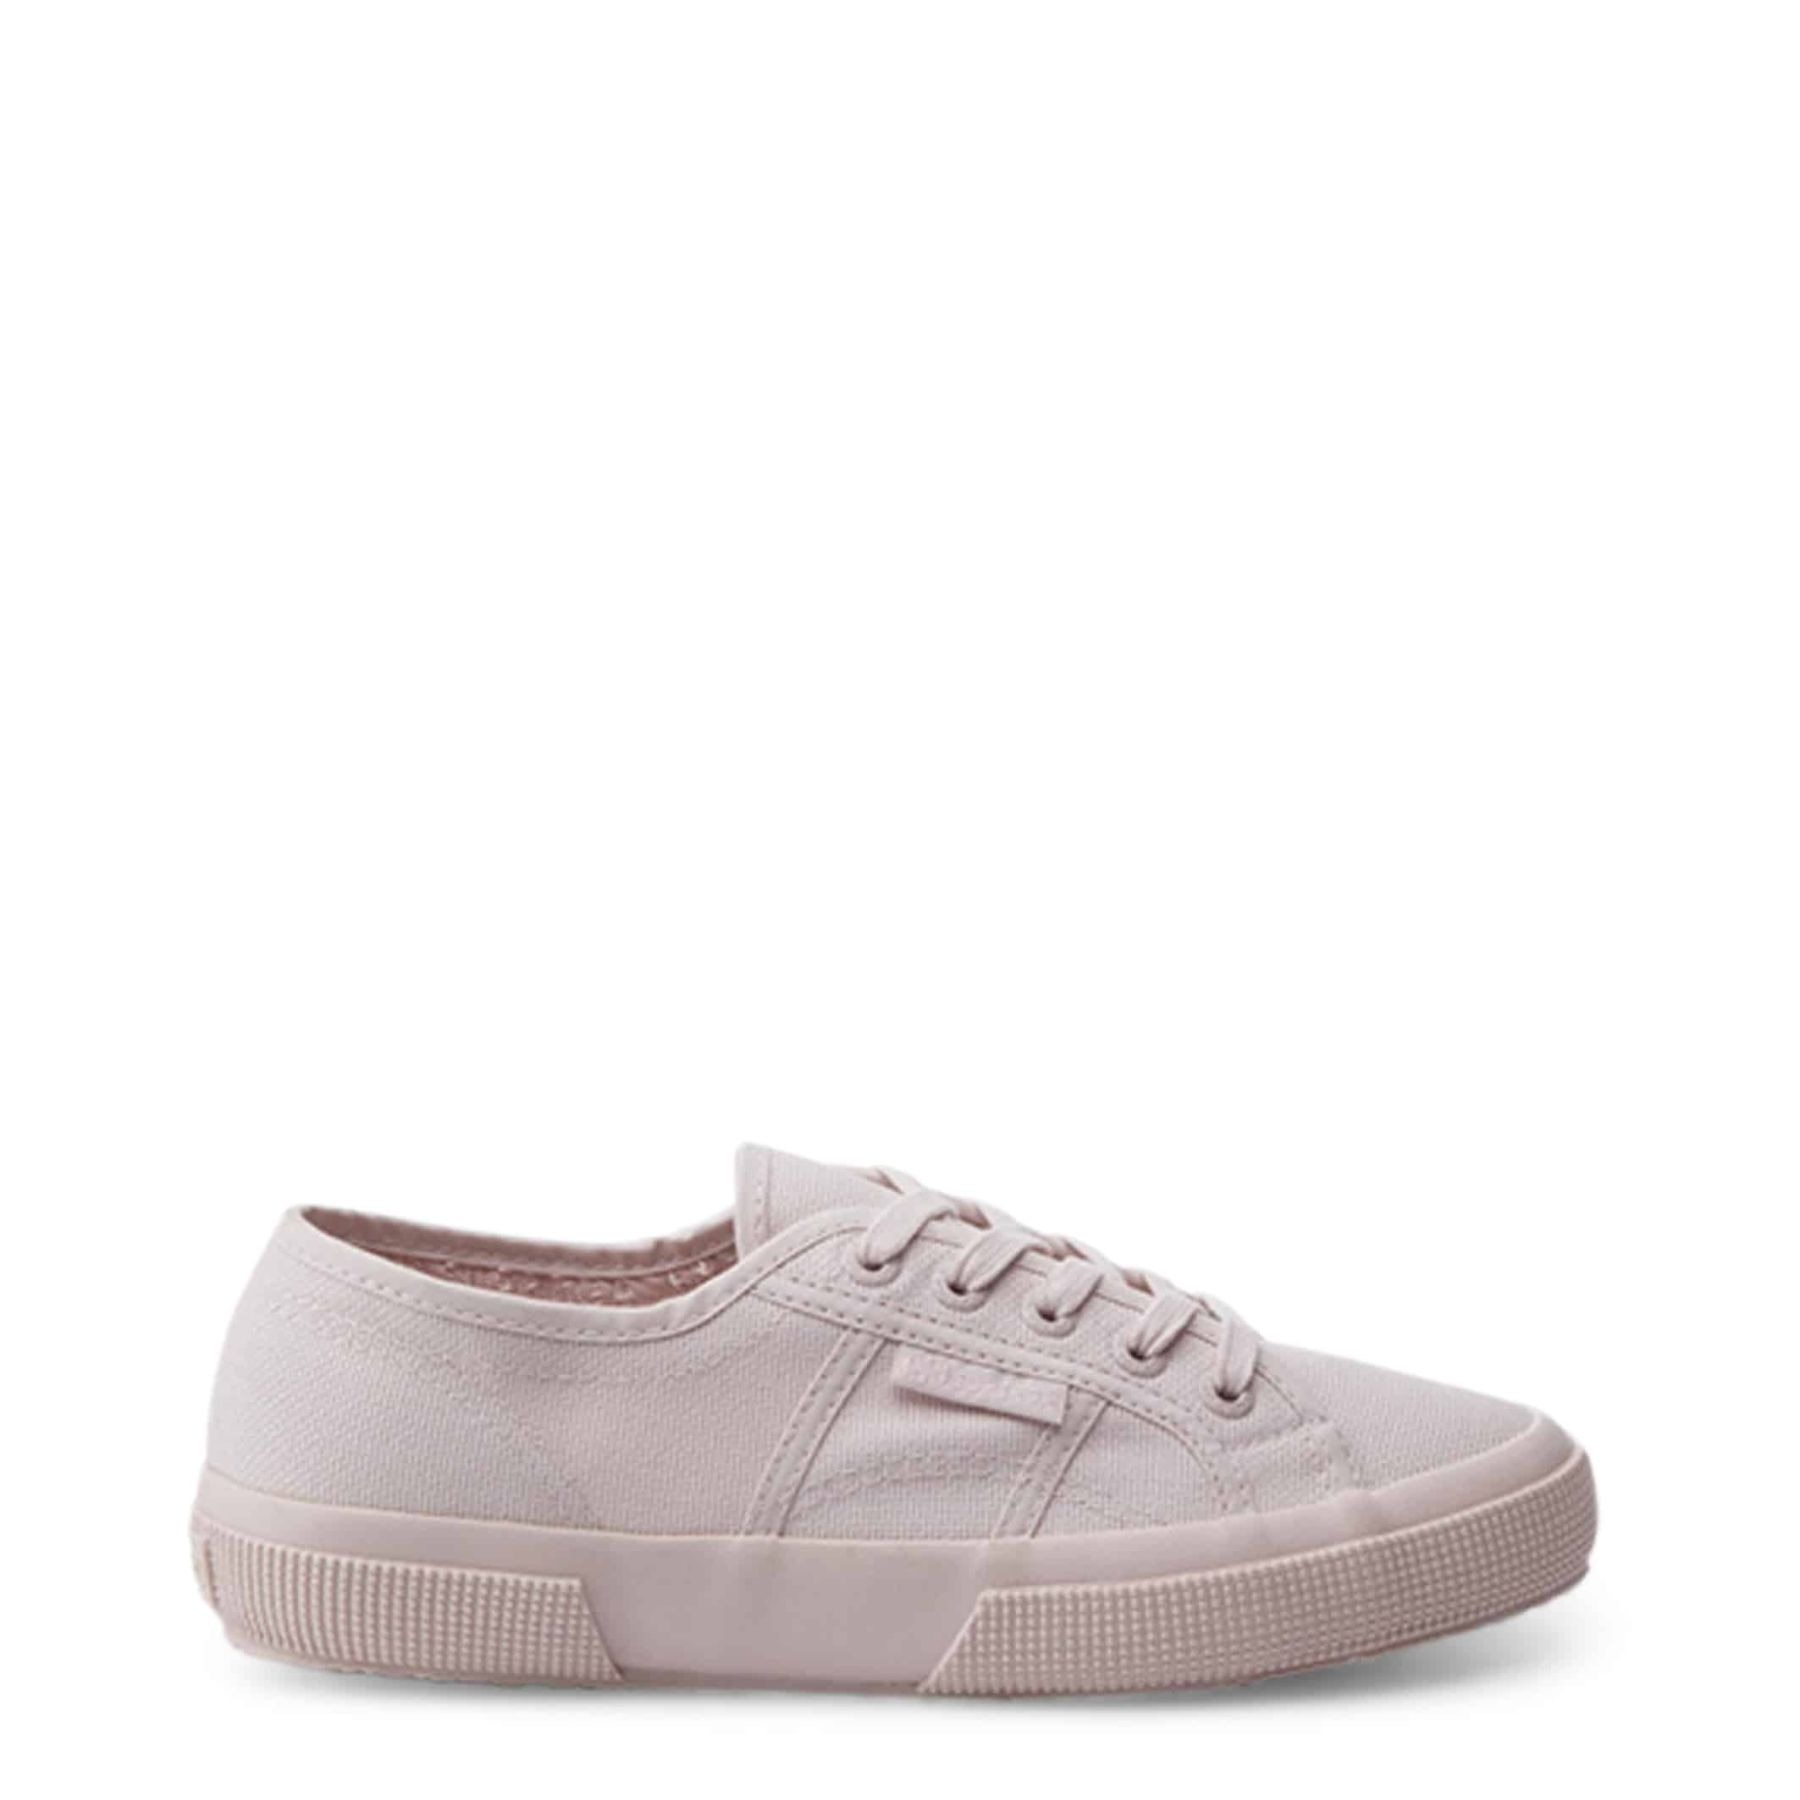 Superga - 2750-CotuClassic-S000010W - Rosa Sneakers mujer, calzado de mujer, originales, deportivas